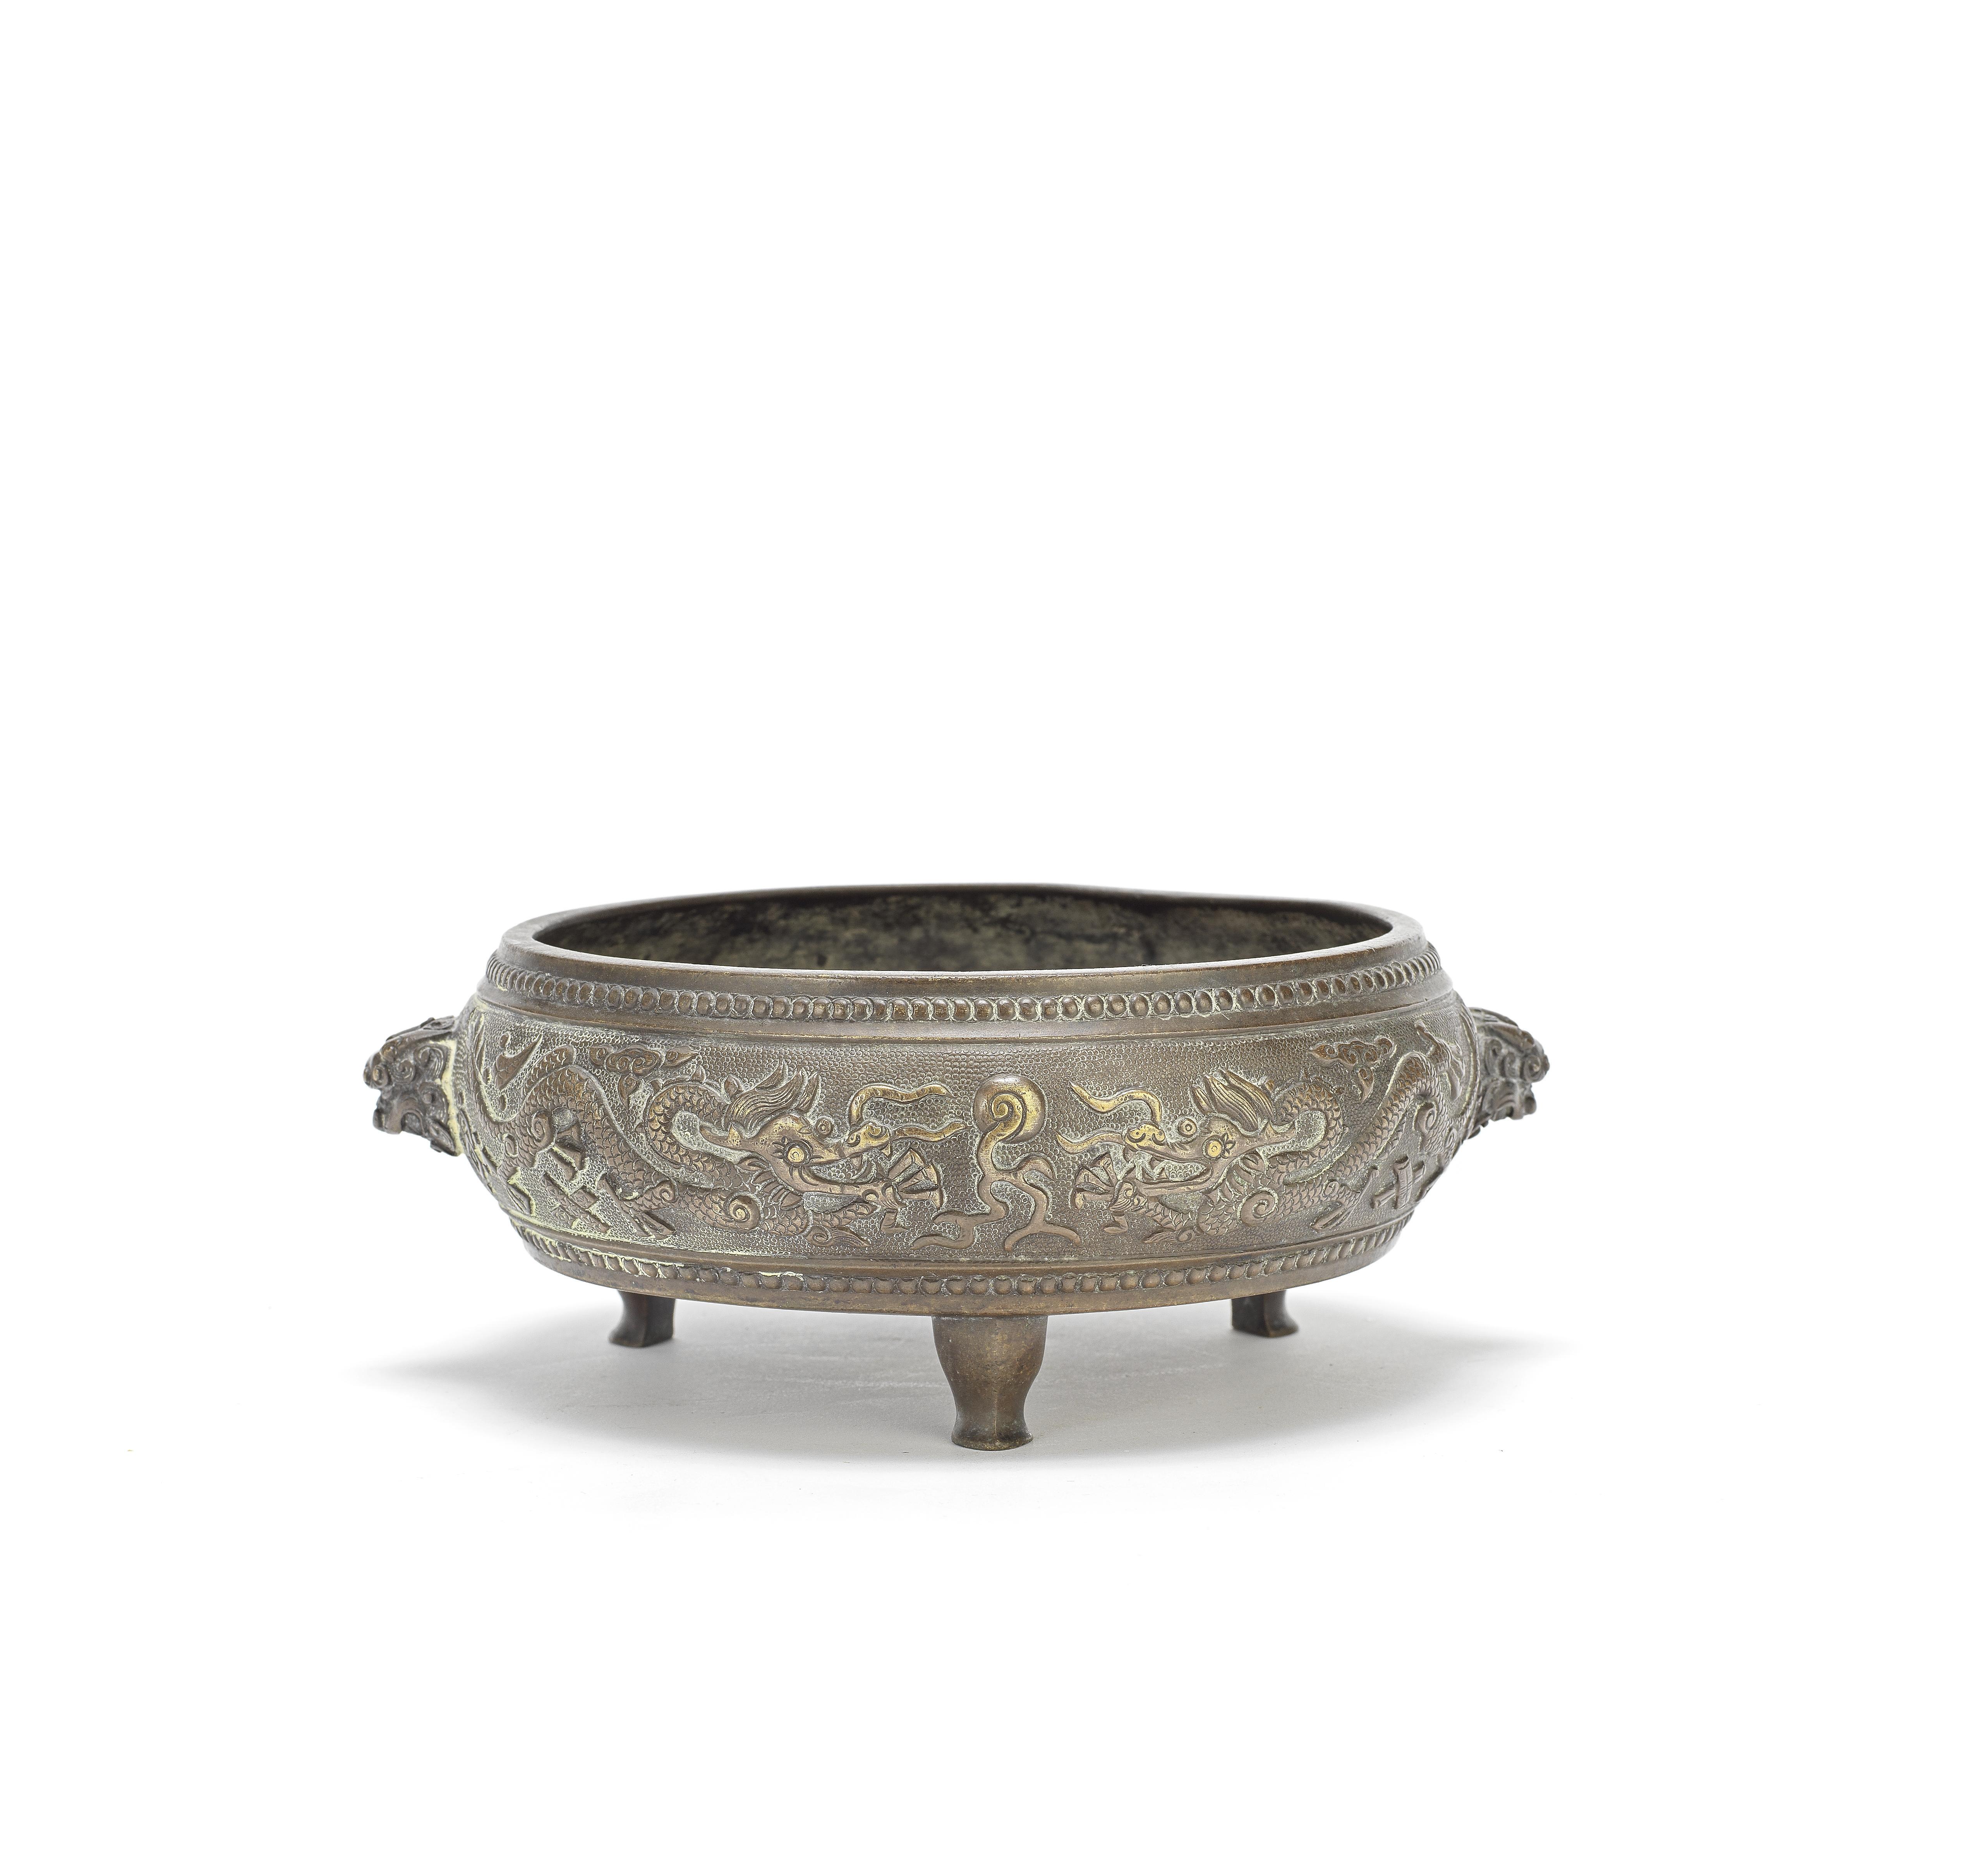 A BRONZE TRIPOD INCENSE BURNER Qing Dynasty